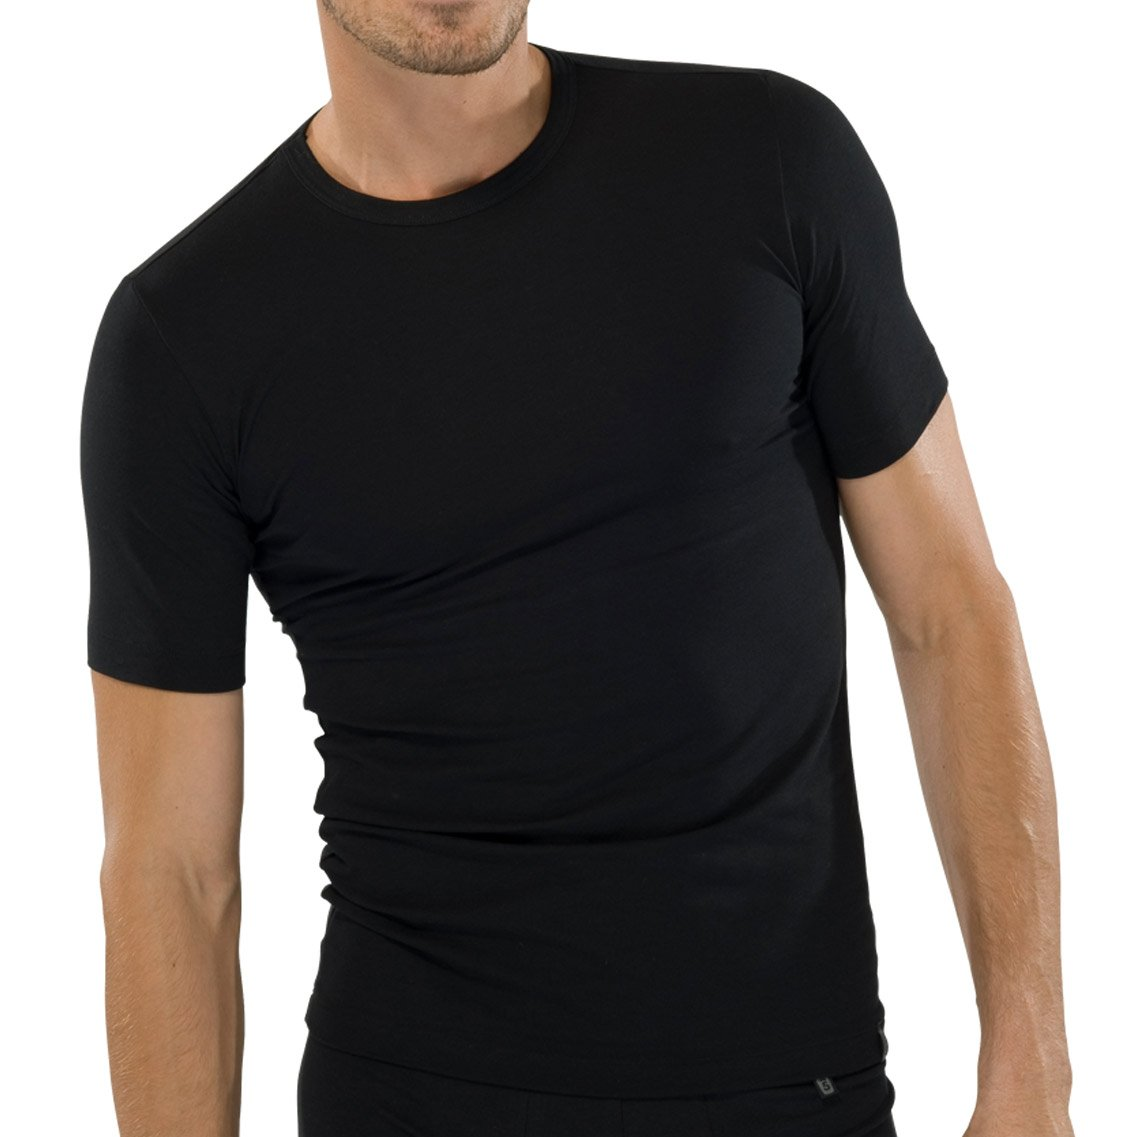 c643c6104ea157 Schiesser 2er Pack Herren T-Shirt Rundhals Kurzarm